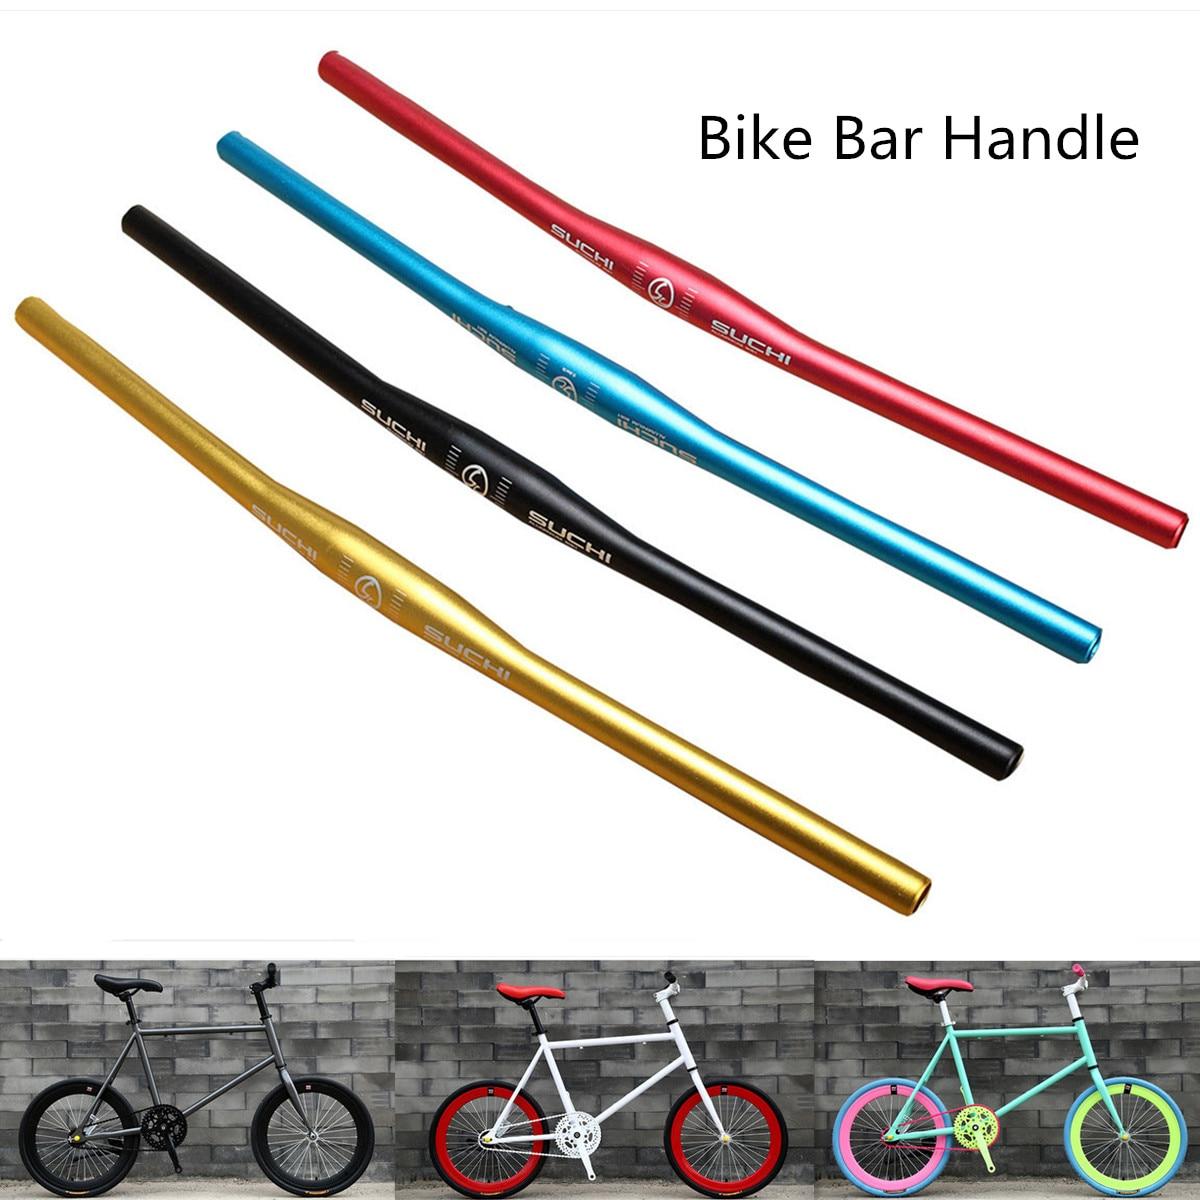 Bicycle Handlebar 620mm Aluminum Alloy MTB Mountain Bike Flat Parts For 31.8mm